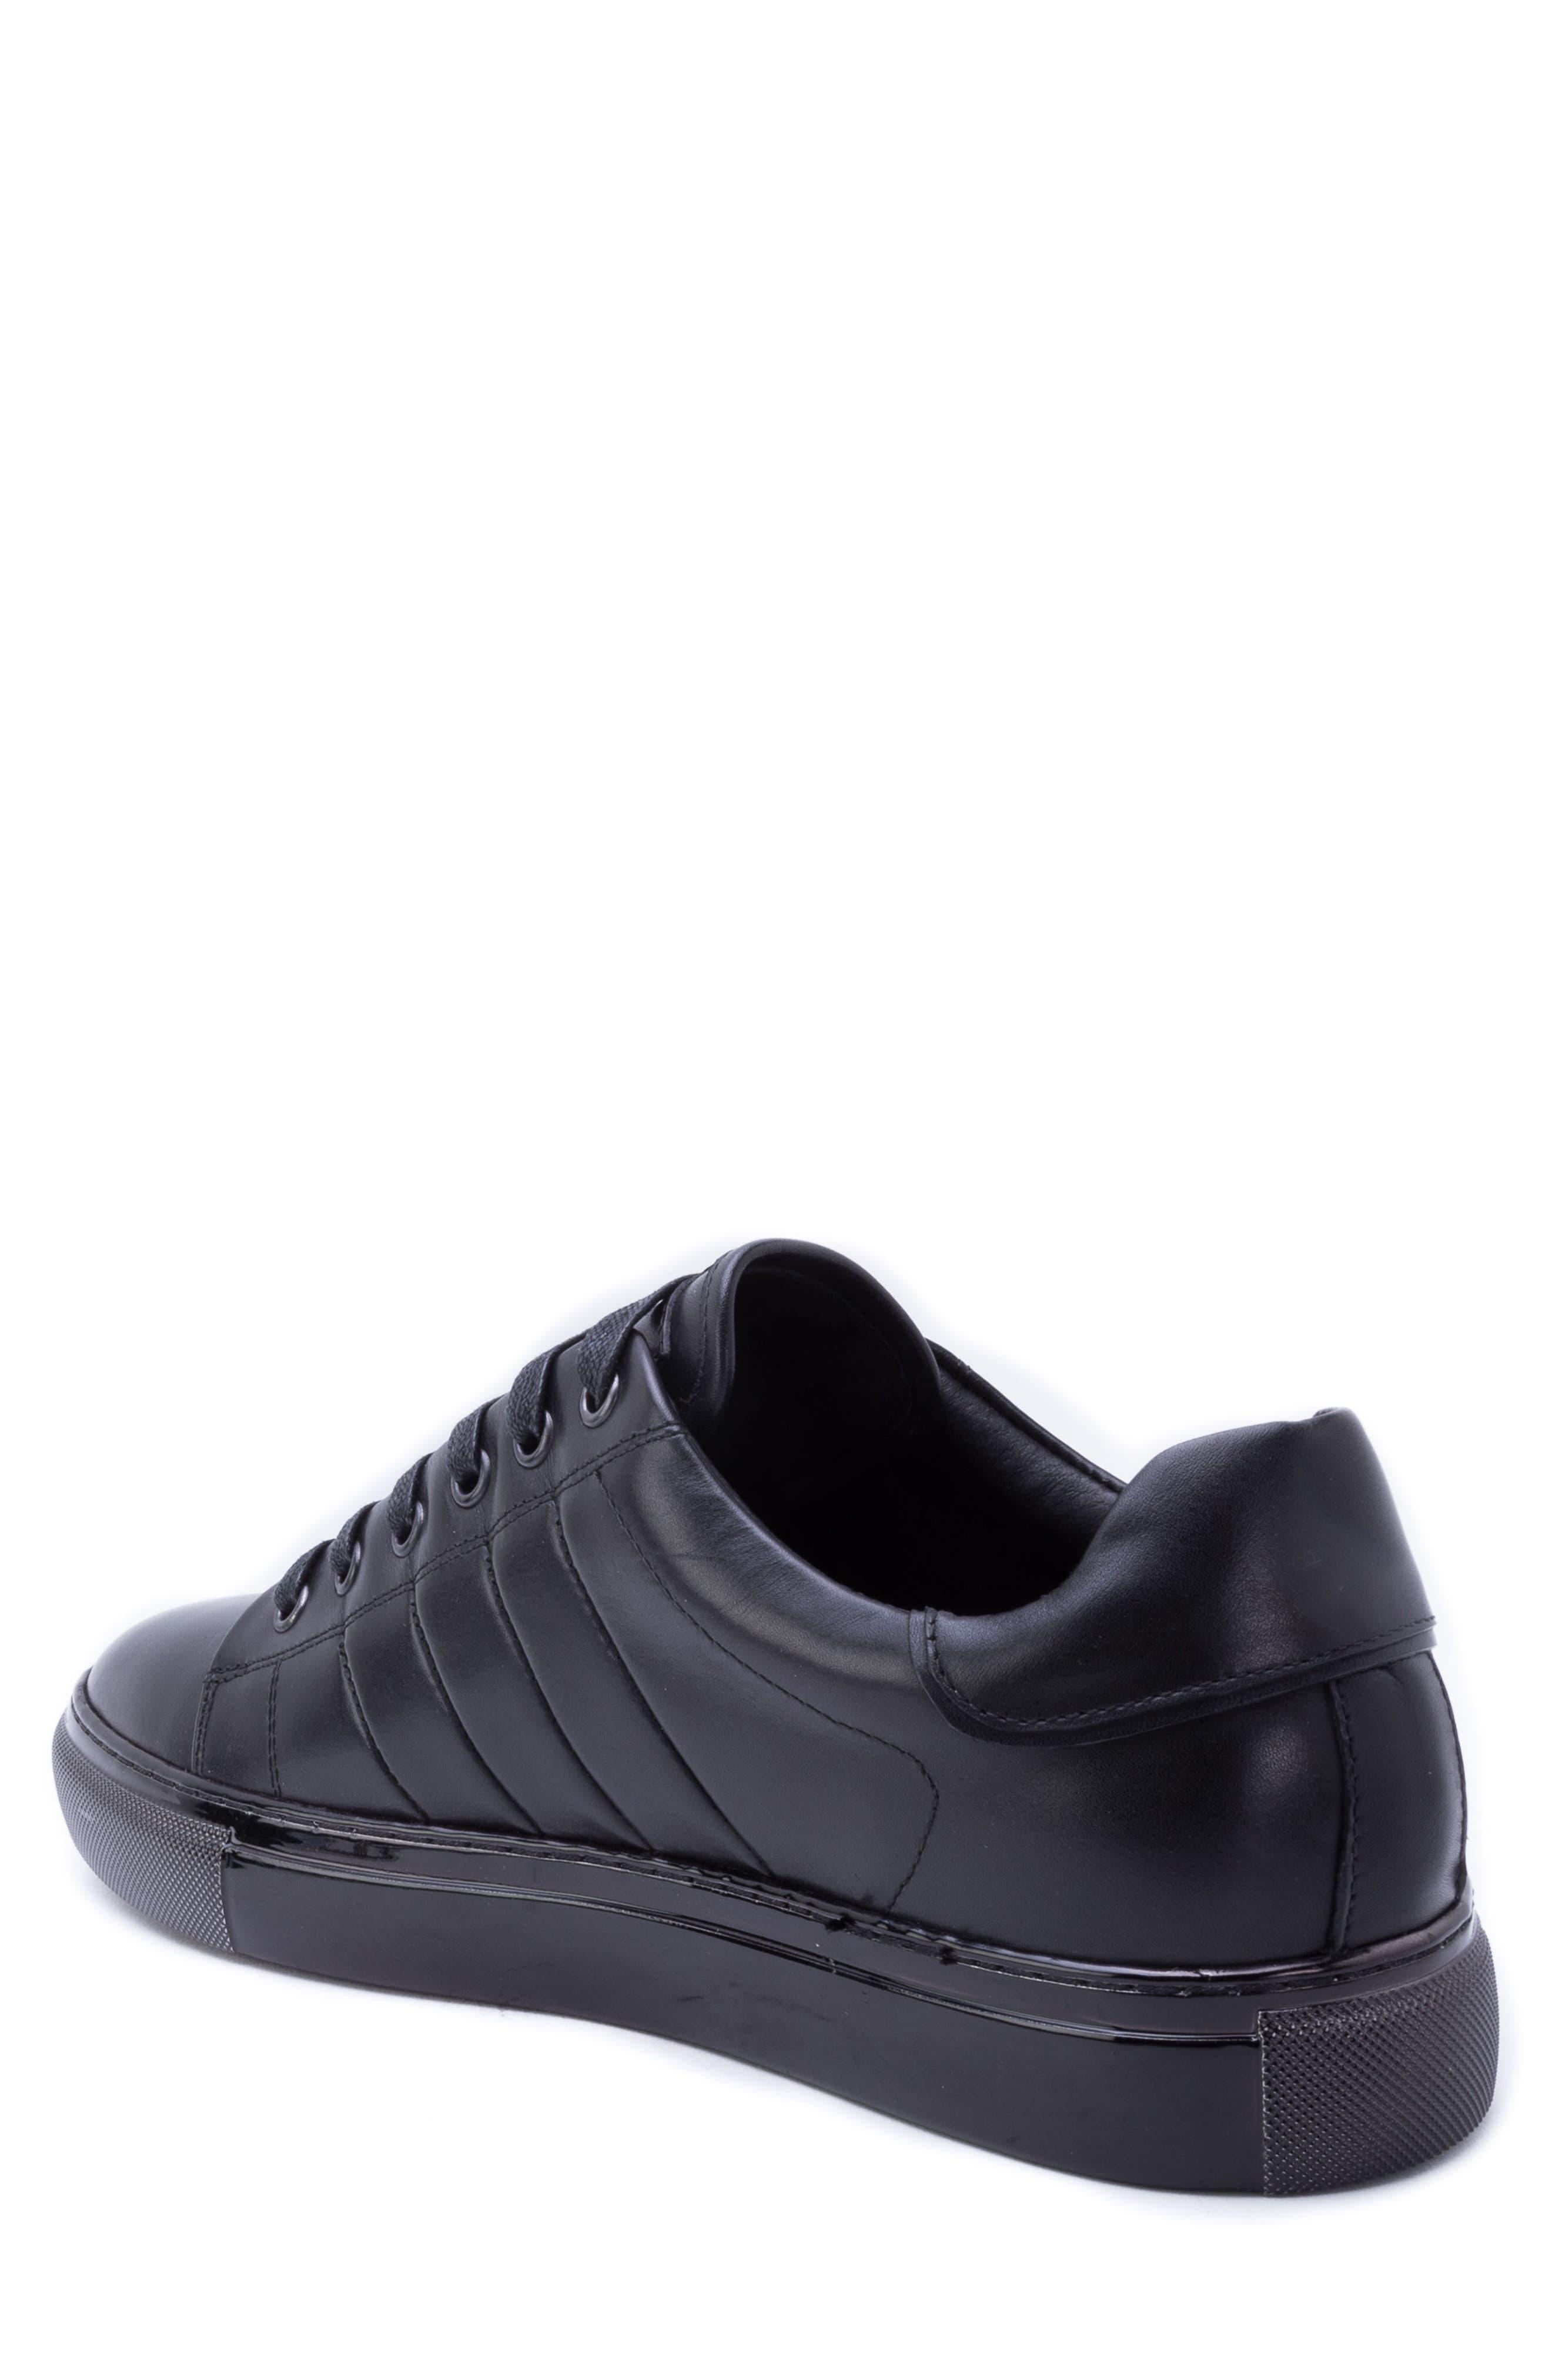 Hackman Sneaker,                             Alternate thumbnail 2, color,                             BLACK LEATHER